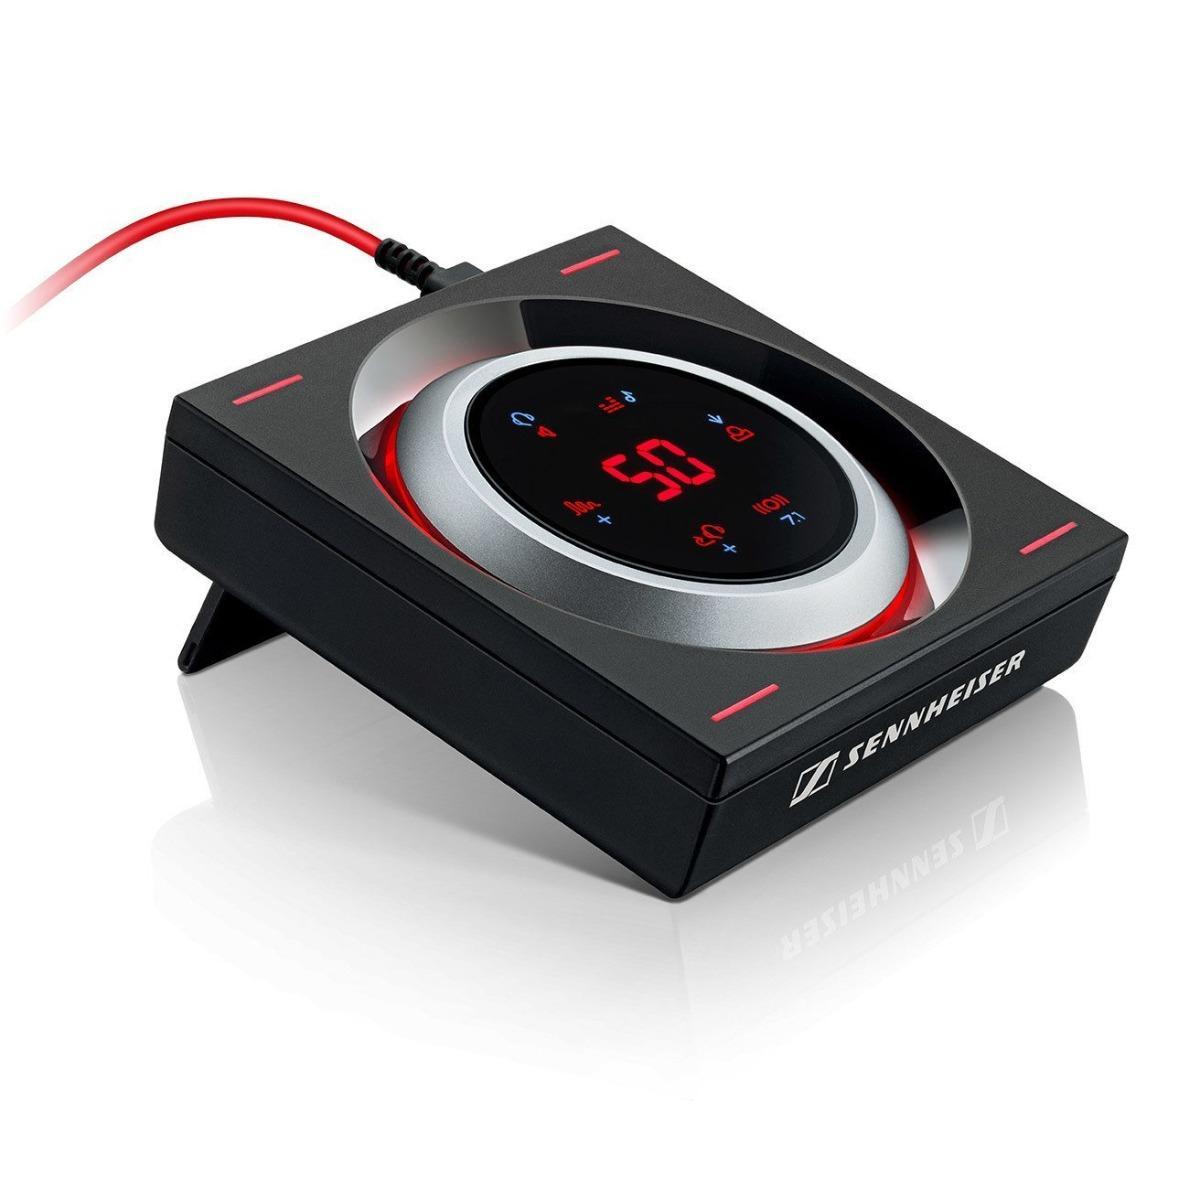 Sennheiser Audio Amplifier Gsx 1000 By Urbanfox Pte Ltd - Sennheiser.